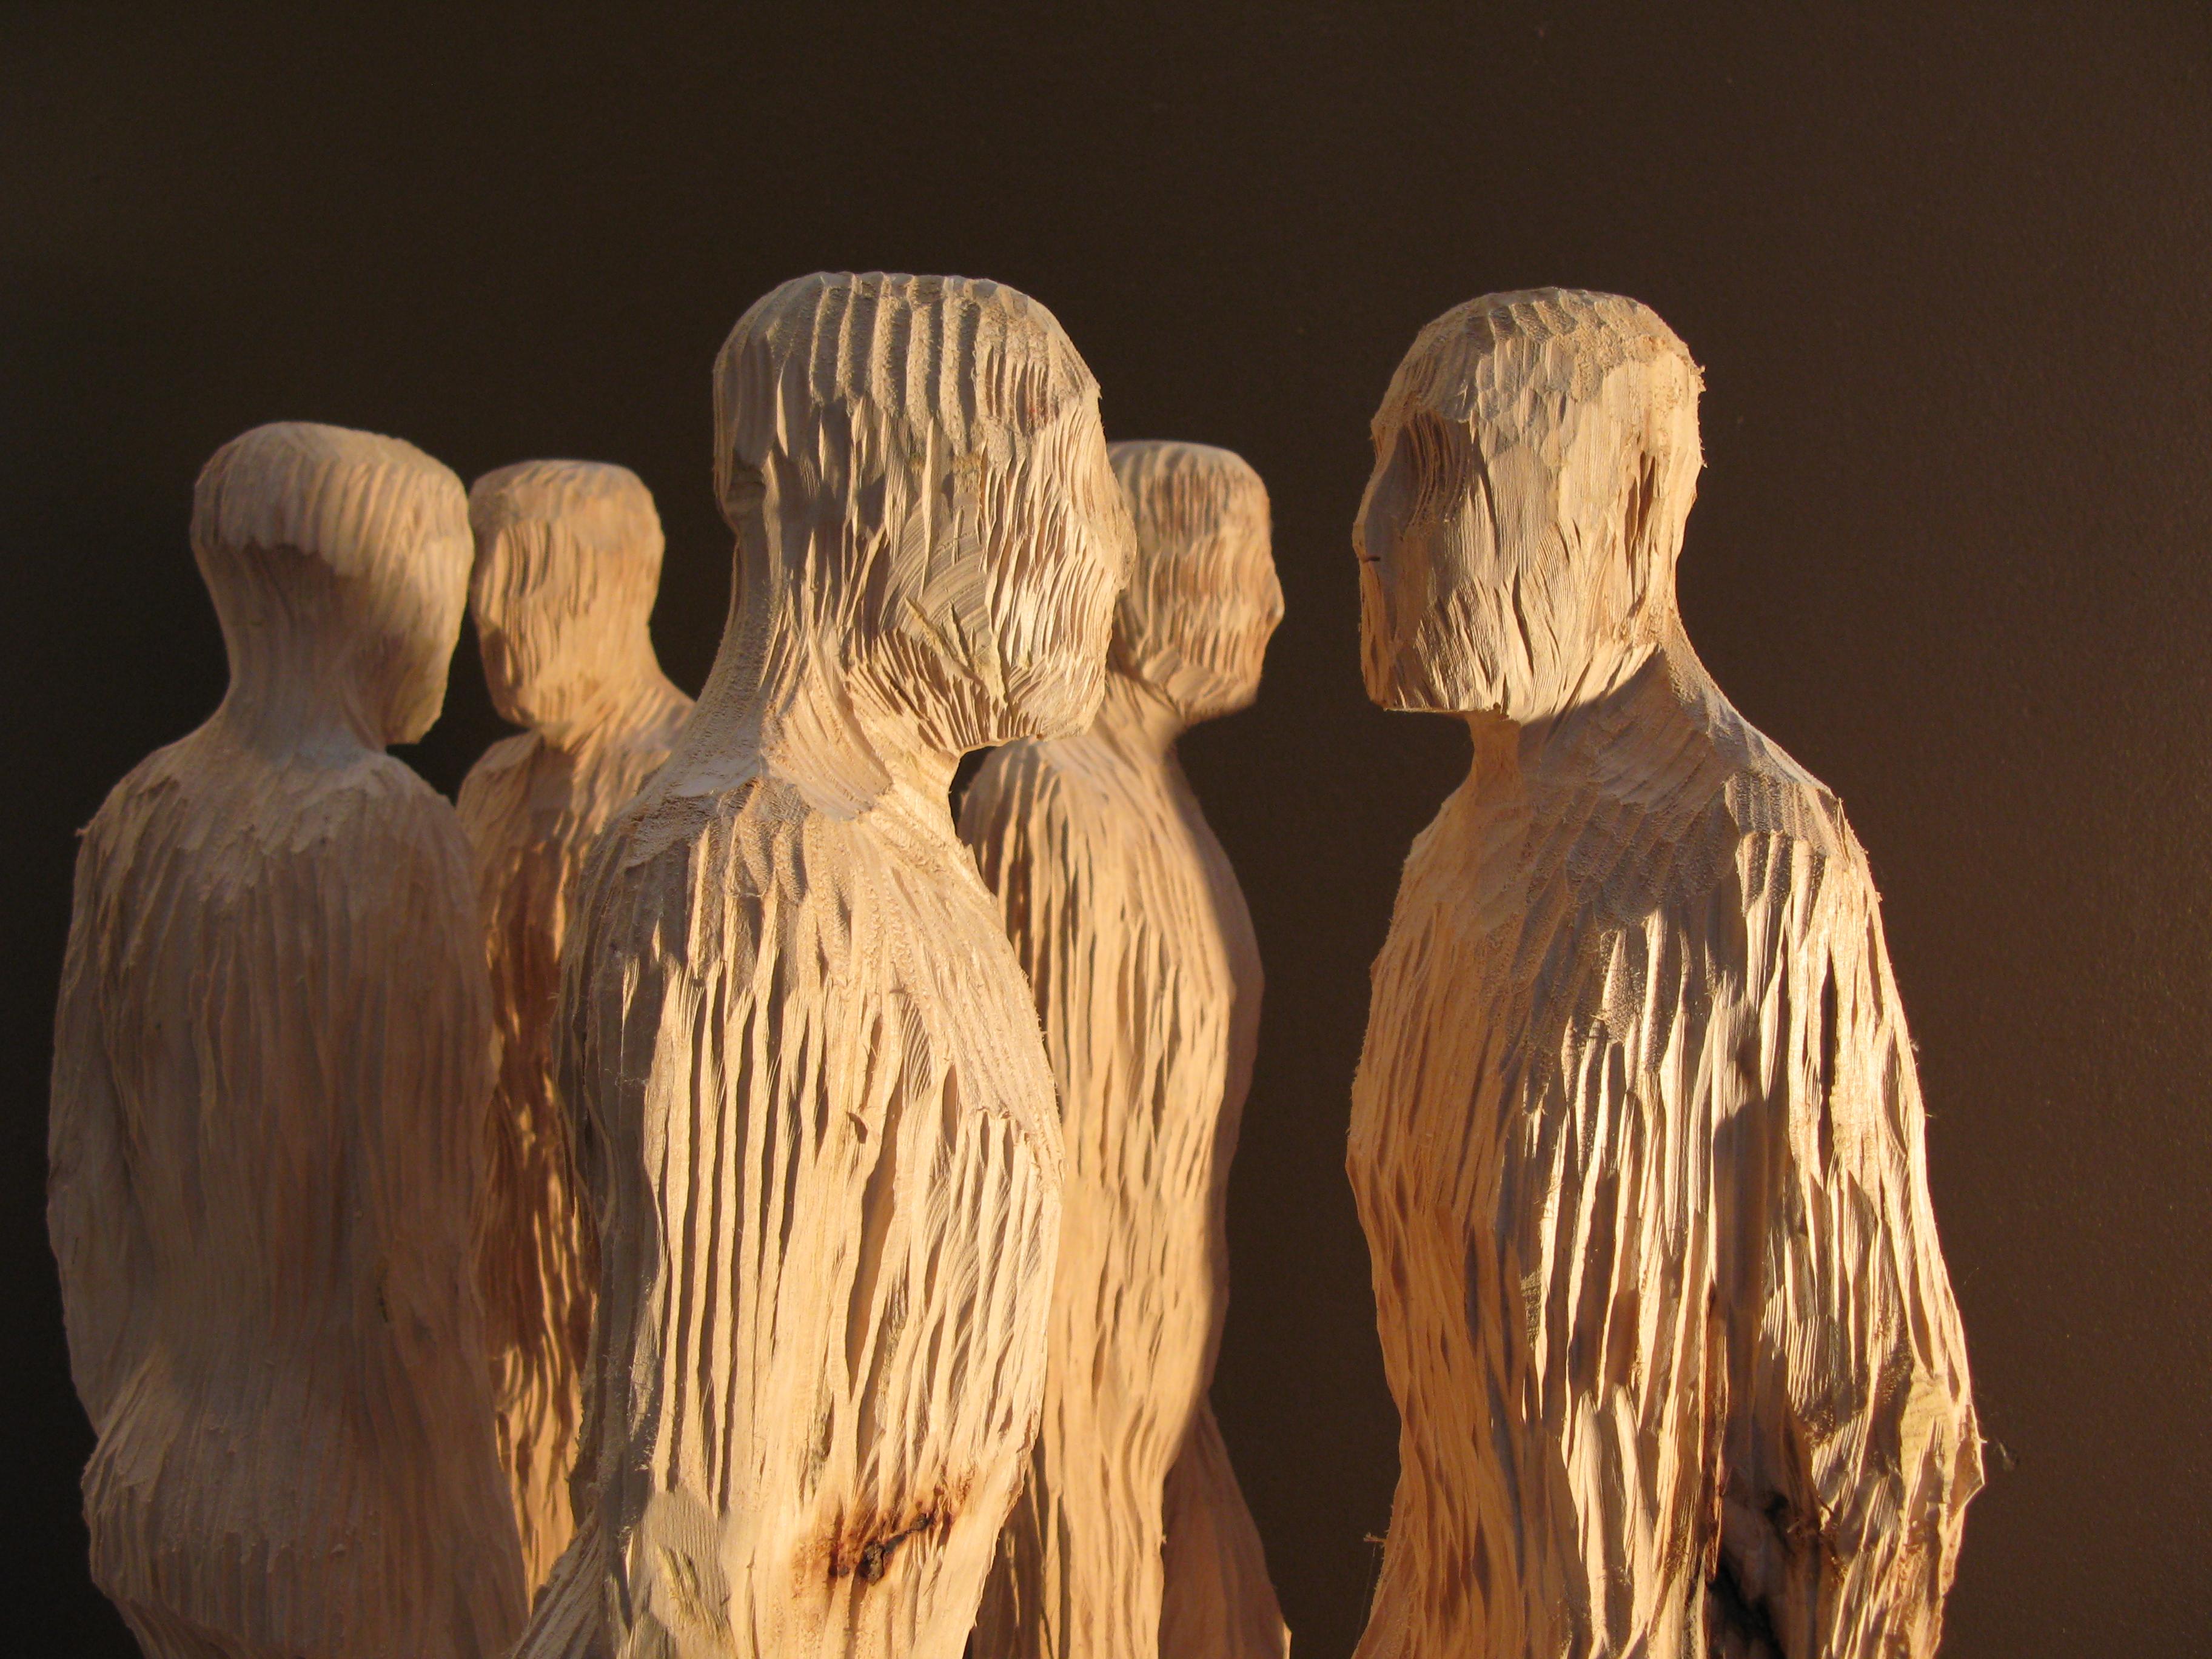 wooden attitudes 4